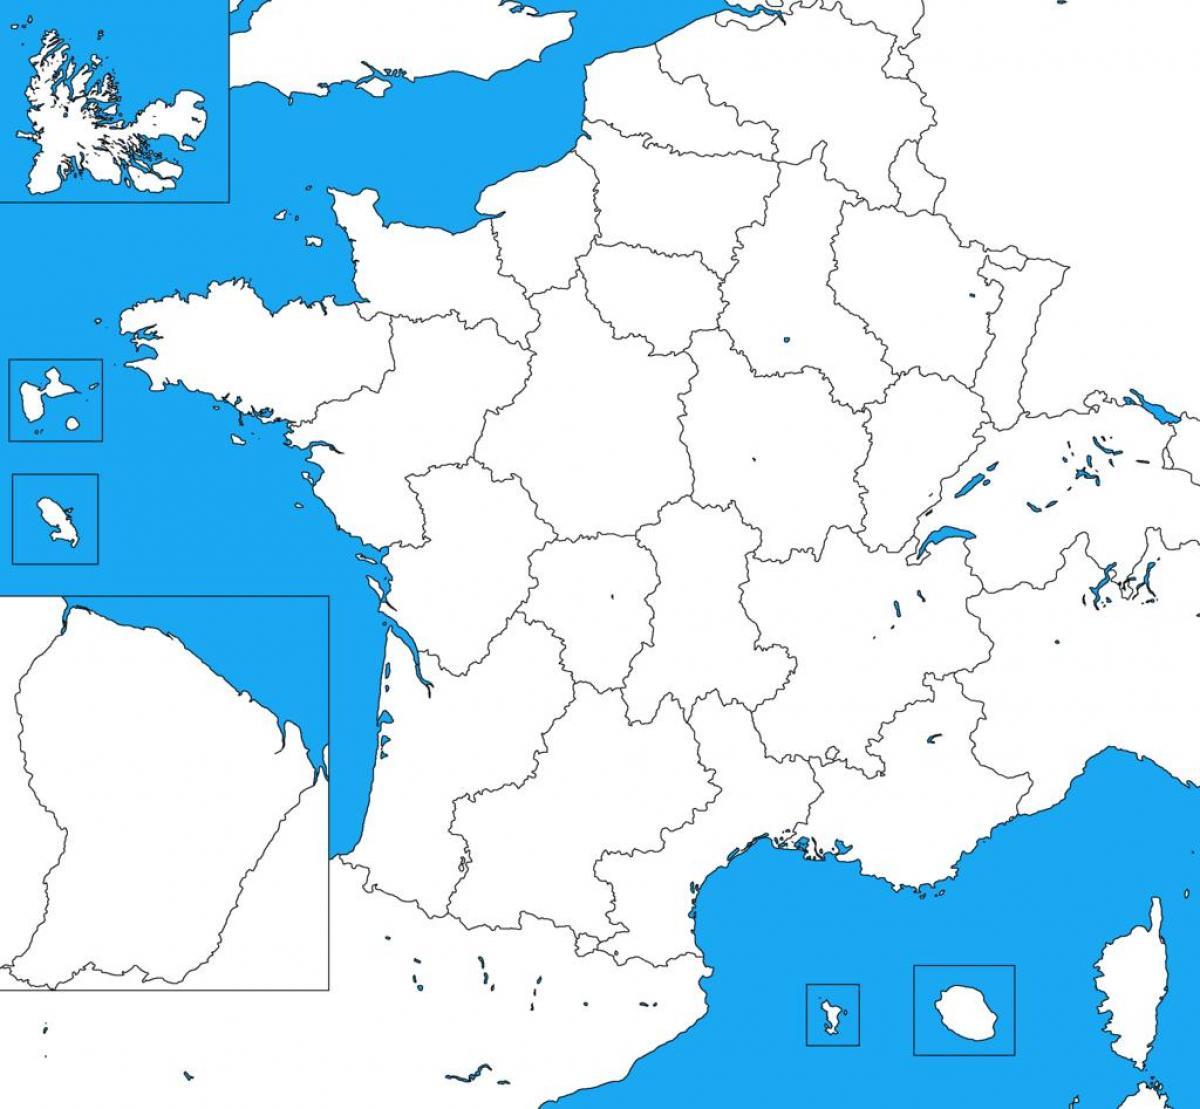 Map Of France Political.Political Map Of France Blank France Map Political Blank Western